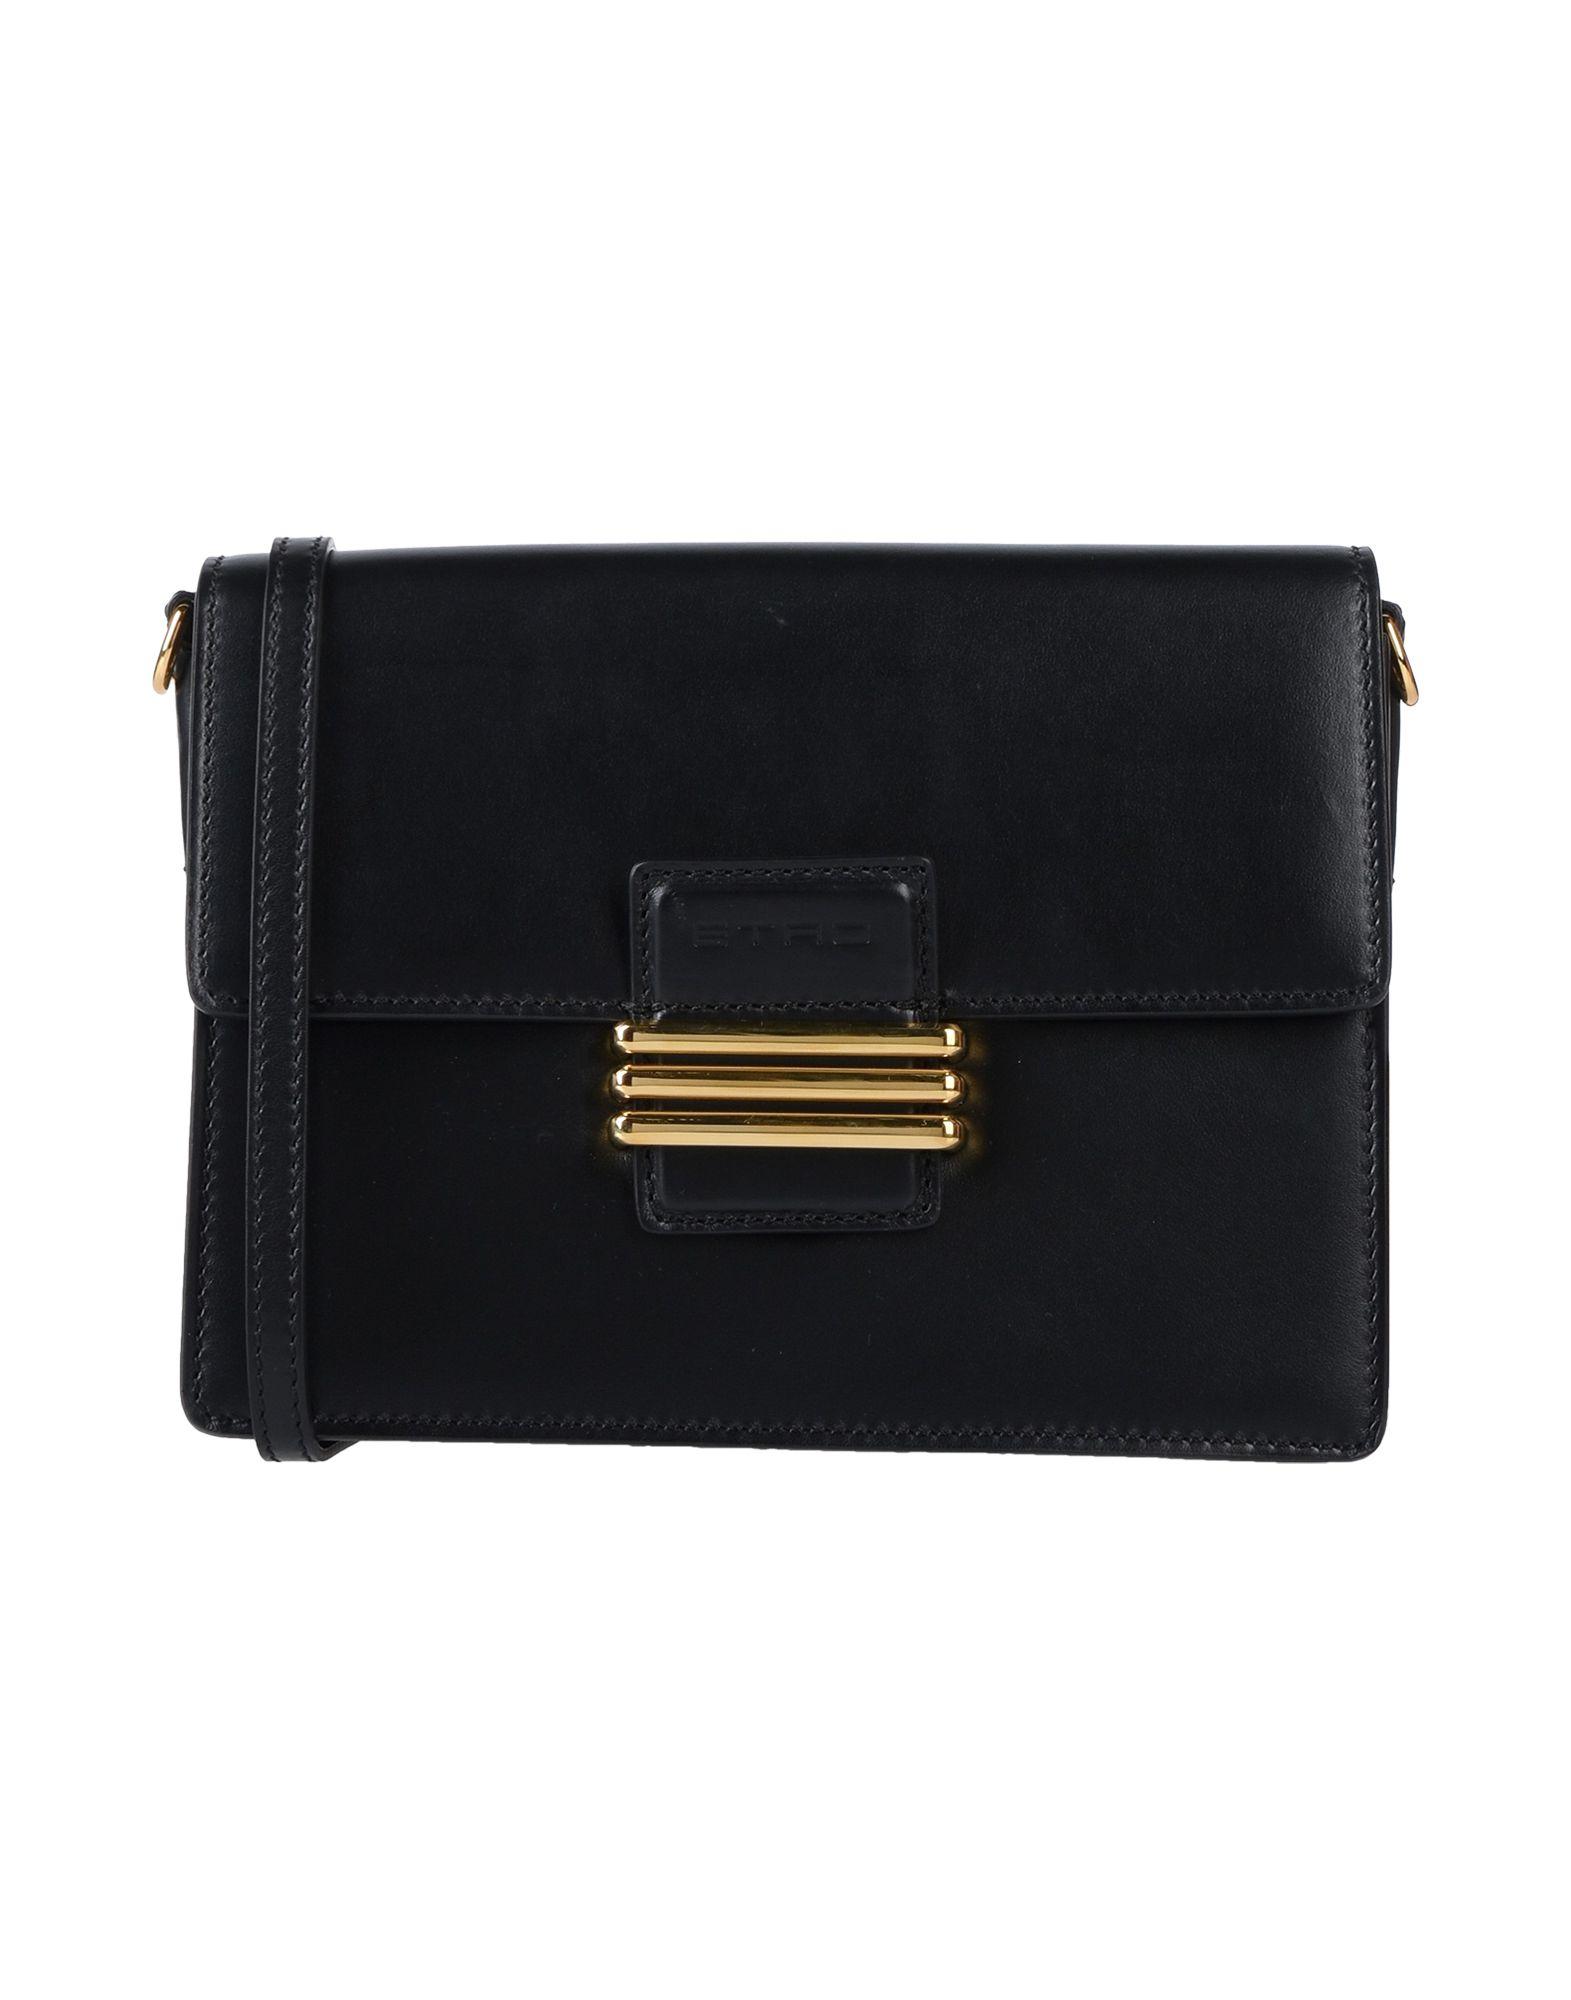 ETRO Сумка через плечо сумка через плечо wsn 2015 pu etro bag0061